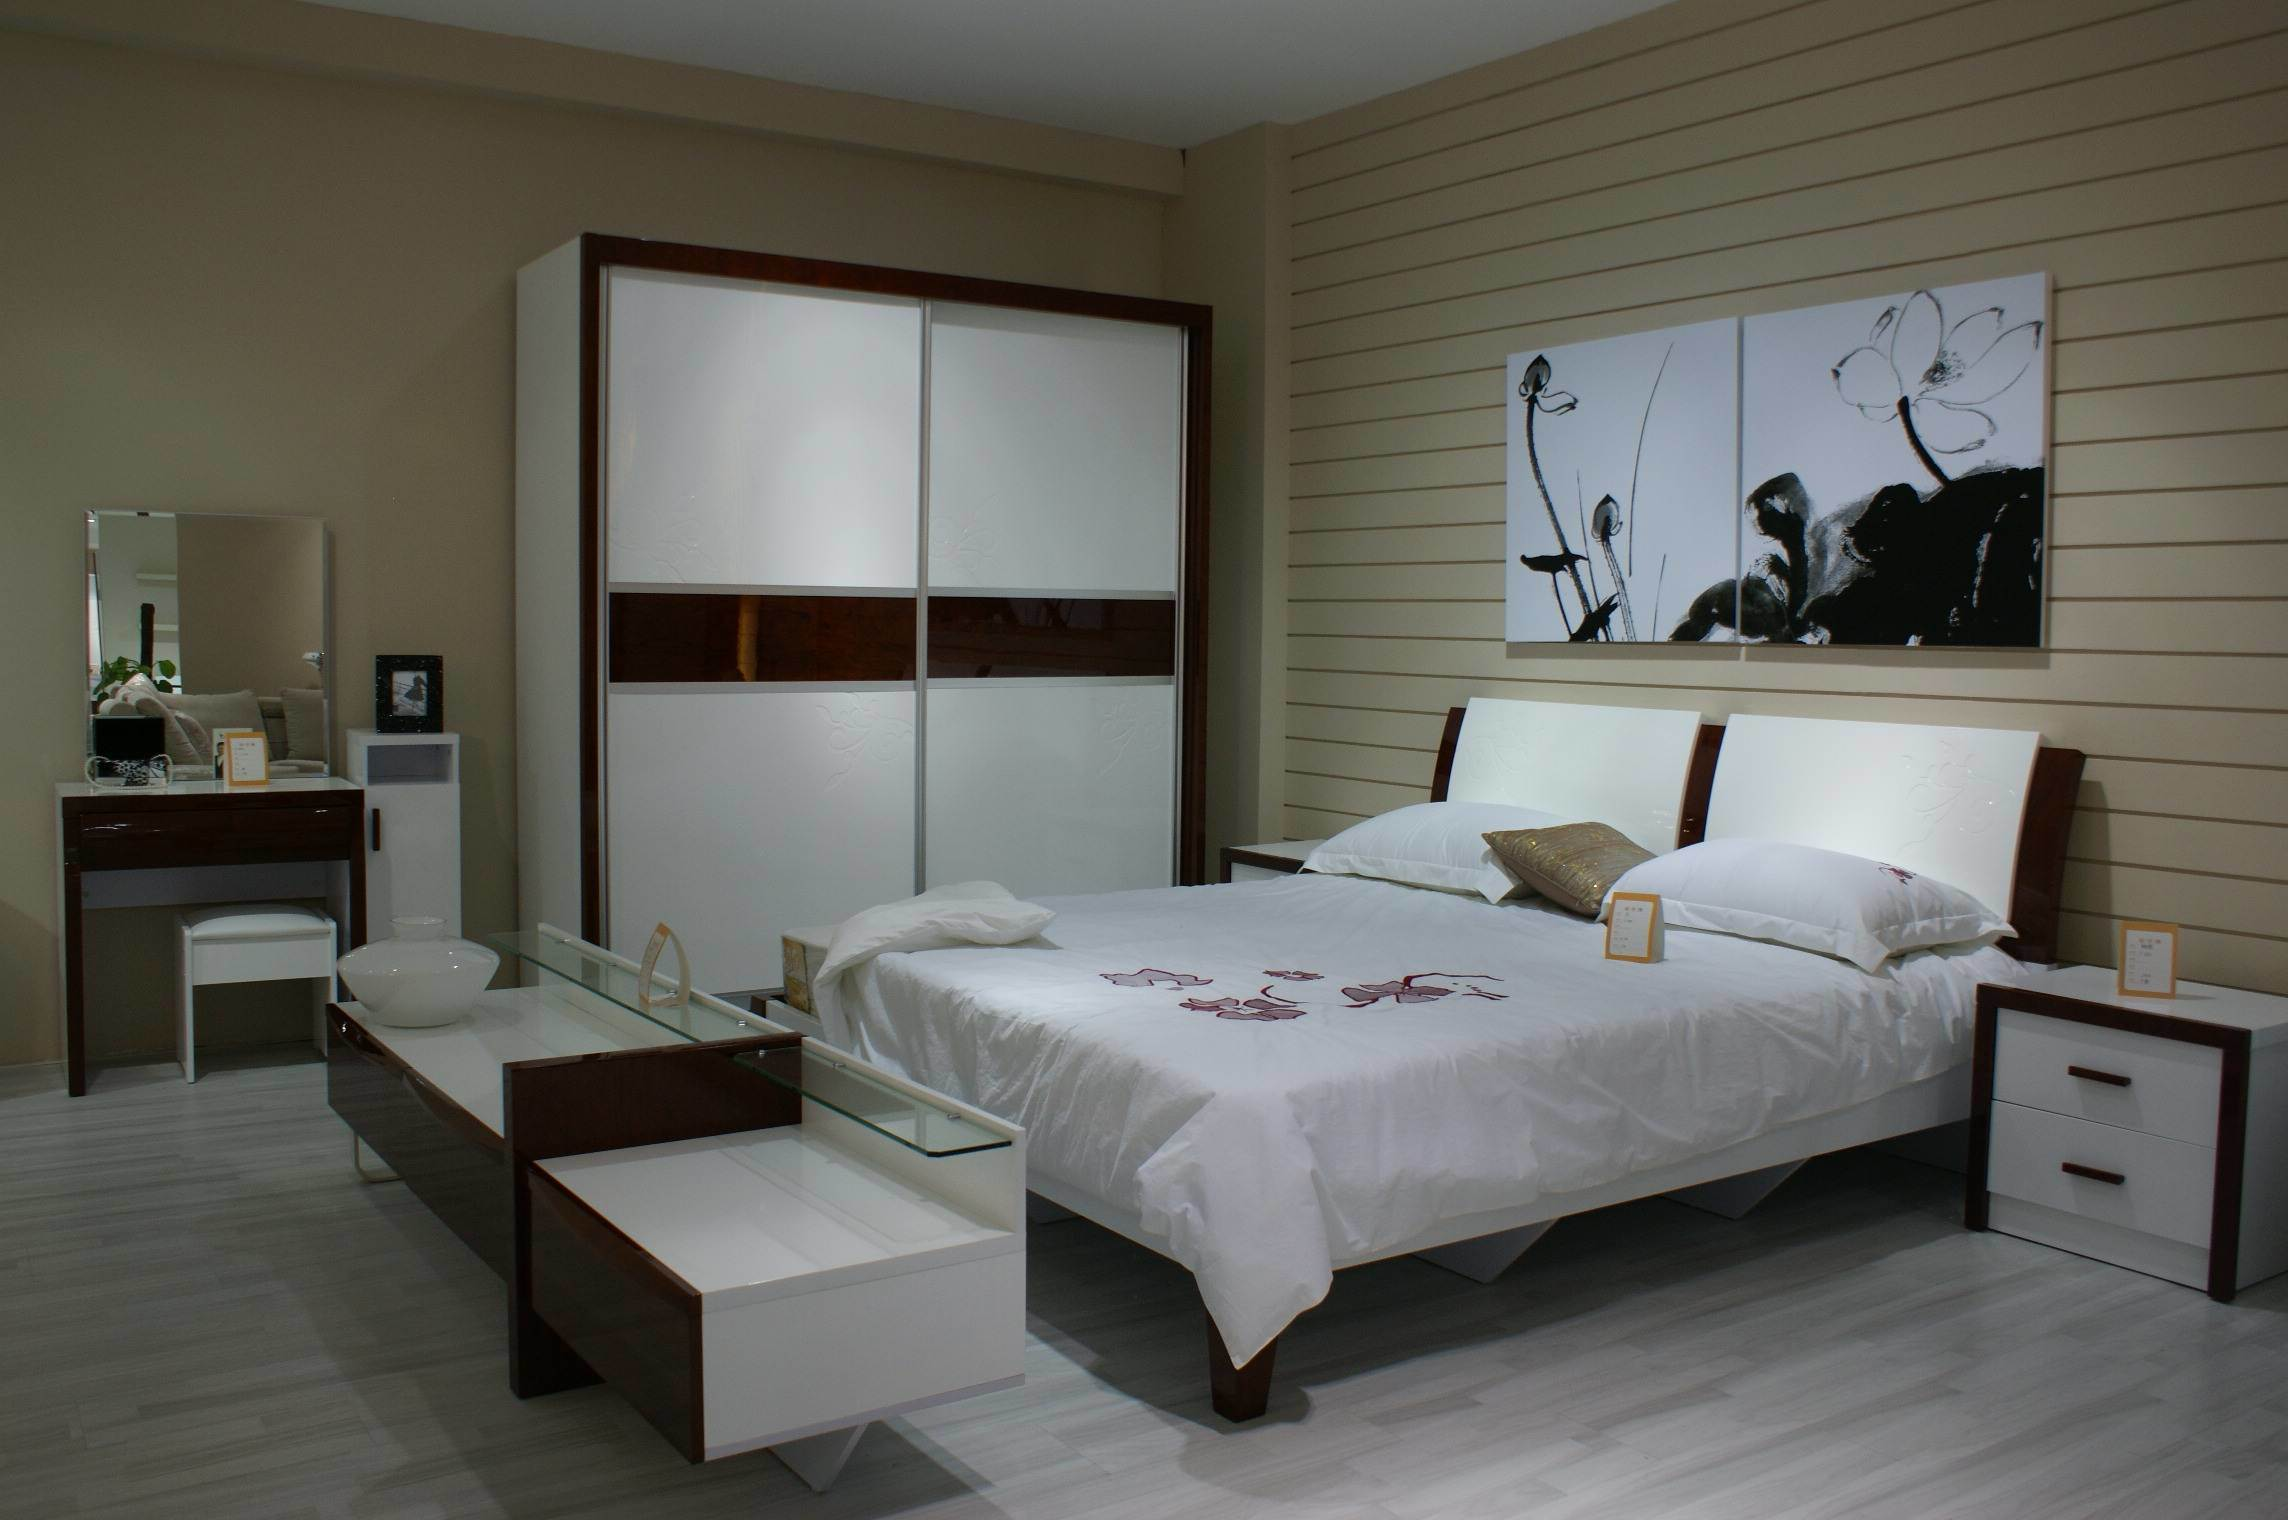 Great Solid Wood Bedroom Furniture Sets 2288 x 1520 · 247 kB · jpeg